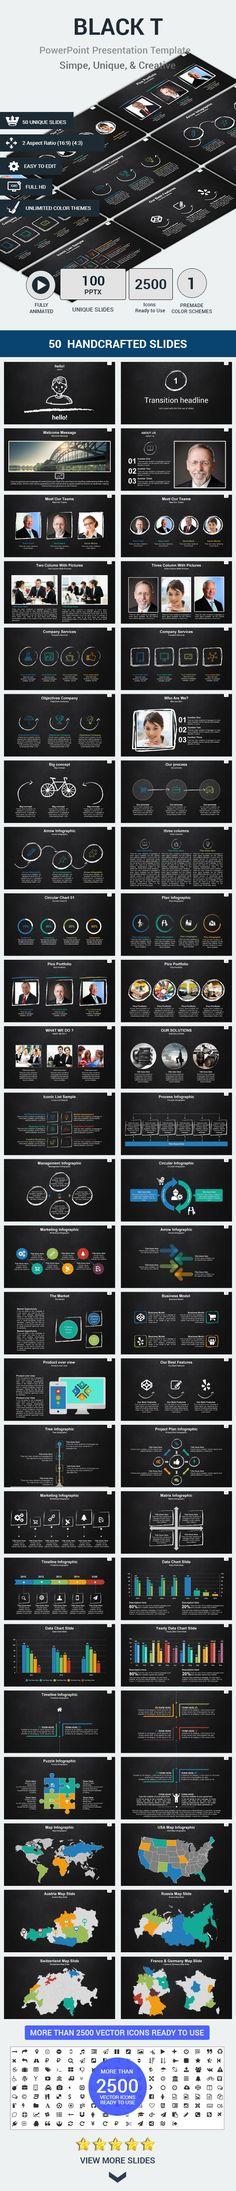 Black PowerPoint Presentation Template #slides #design Download: http://graphicriver.net/item/black-t-presentation-template/13038673?ref=ksioks